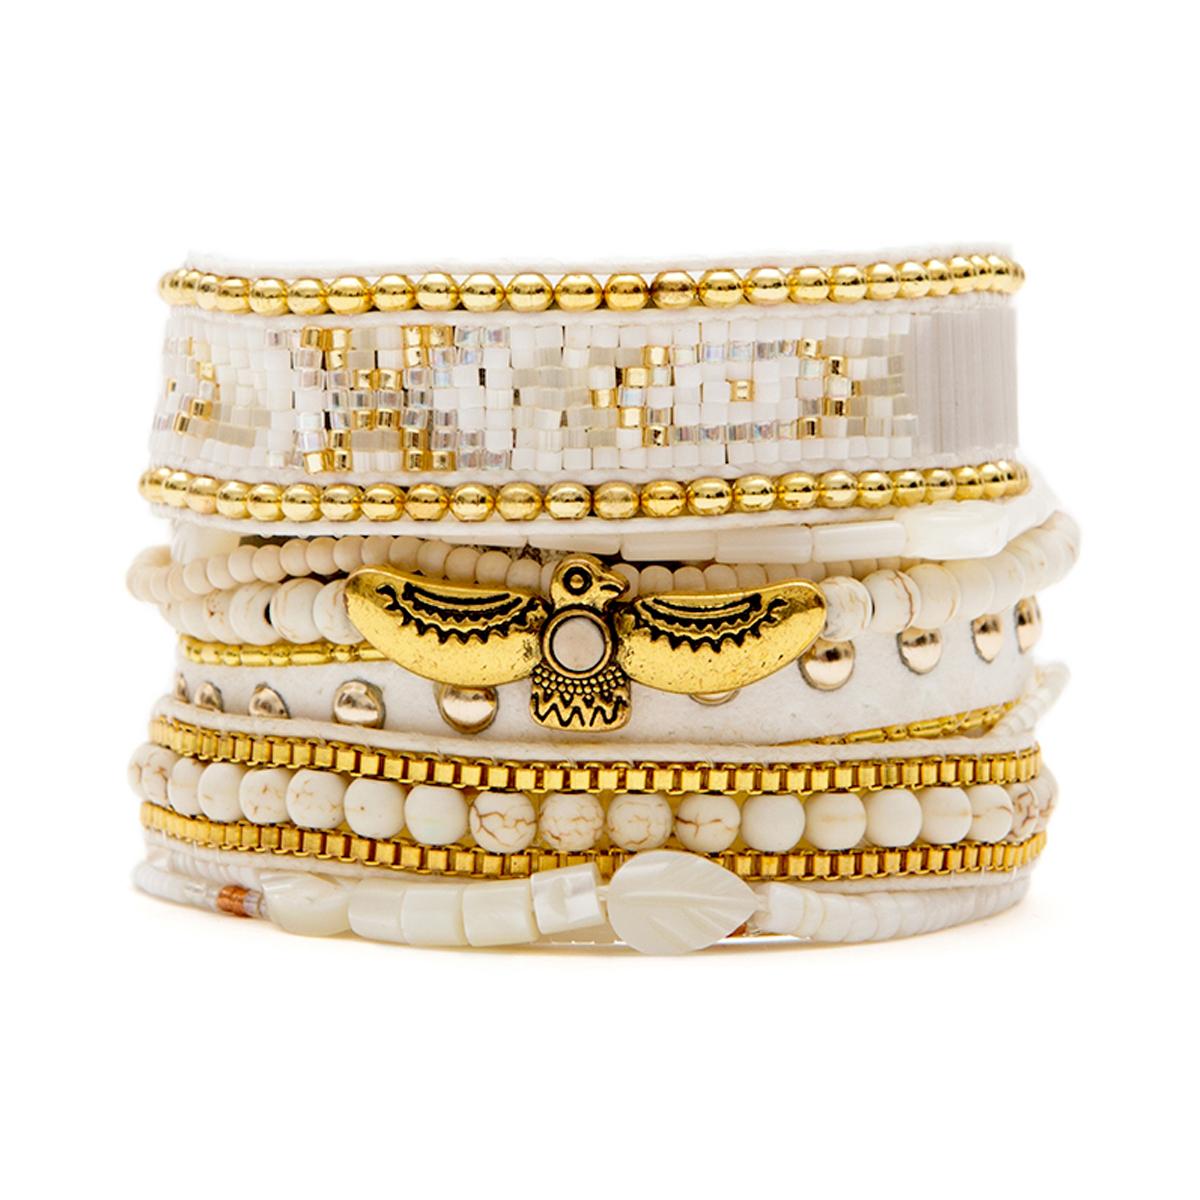 Bracelet blanc en perles, oiseau et fermoir dorés , HIPANEMA OLYMPE